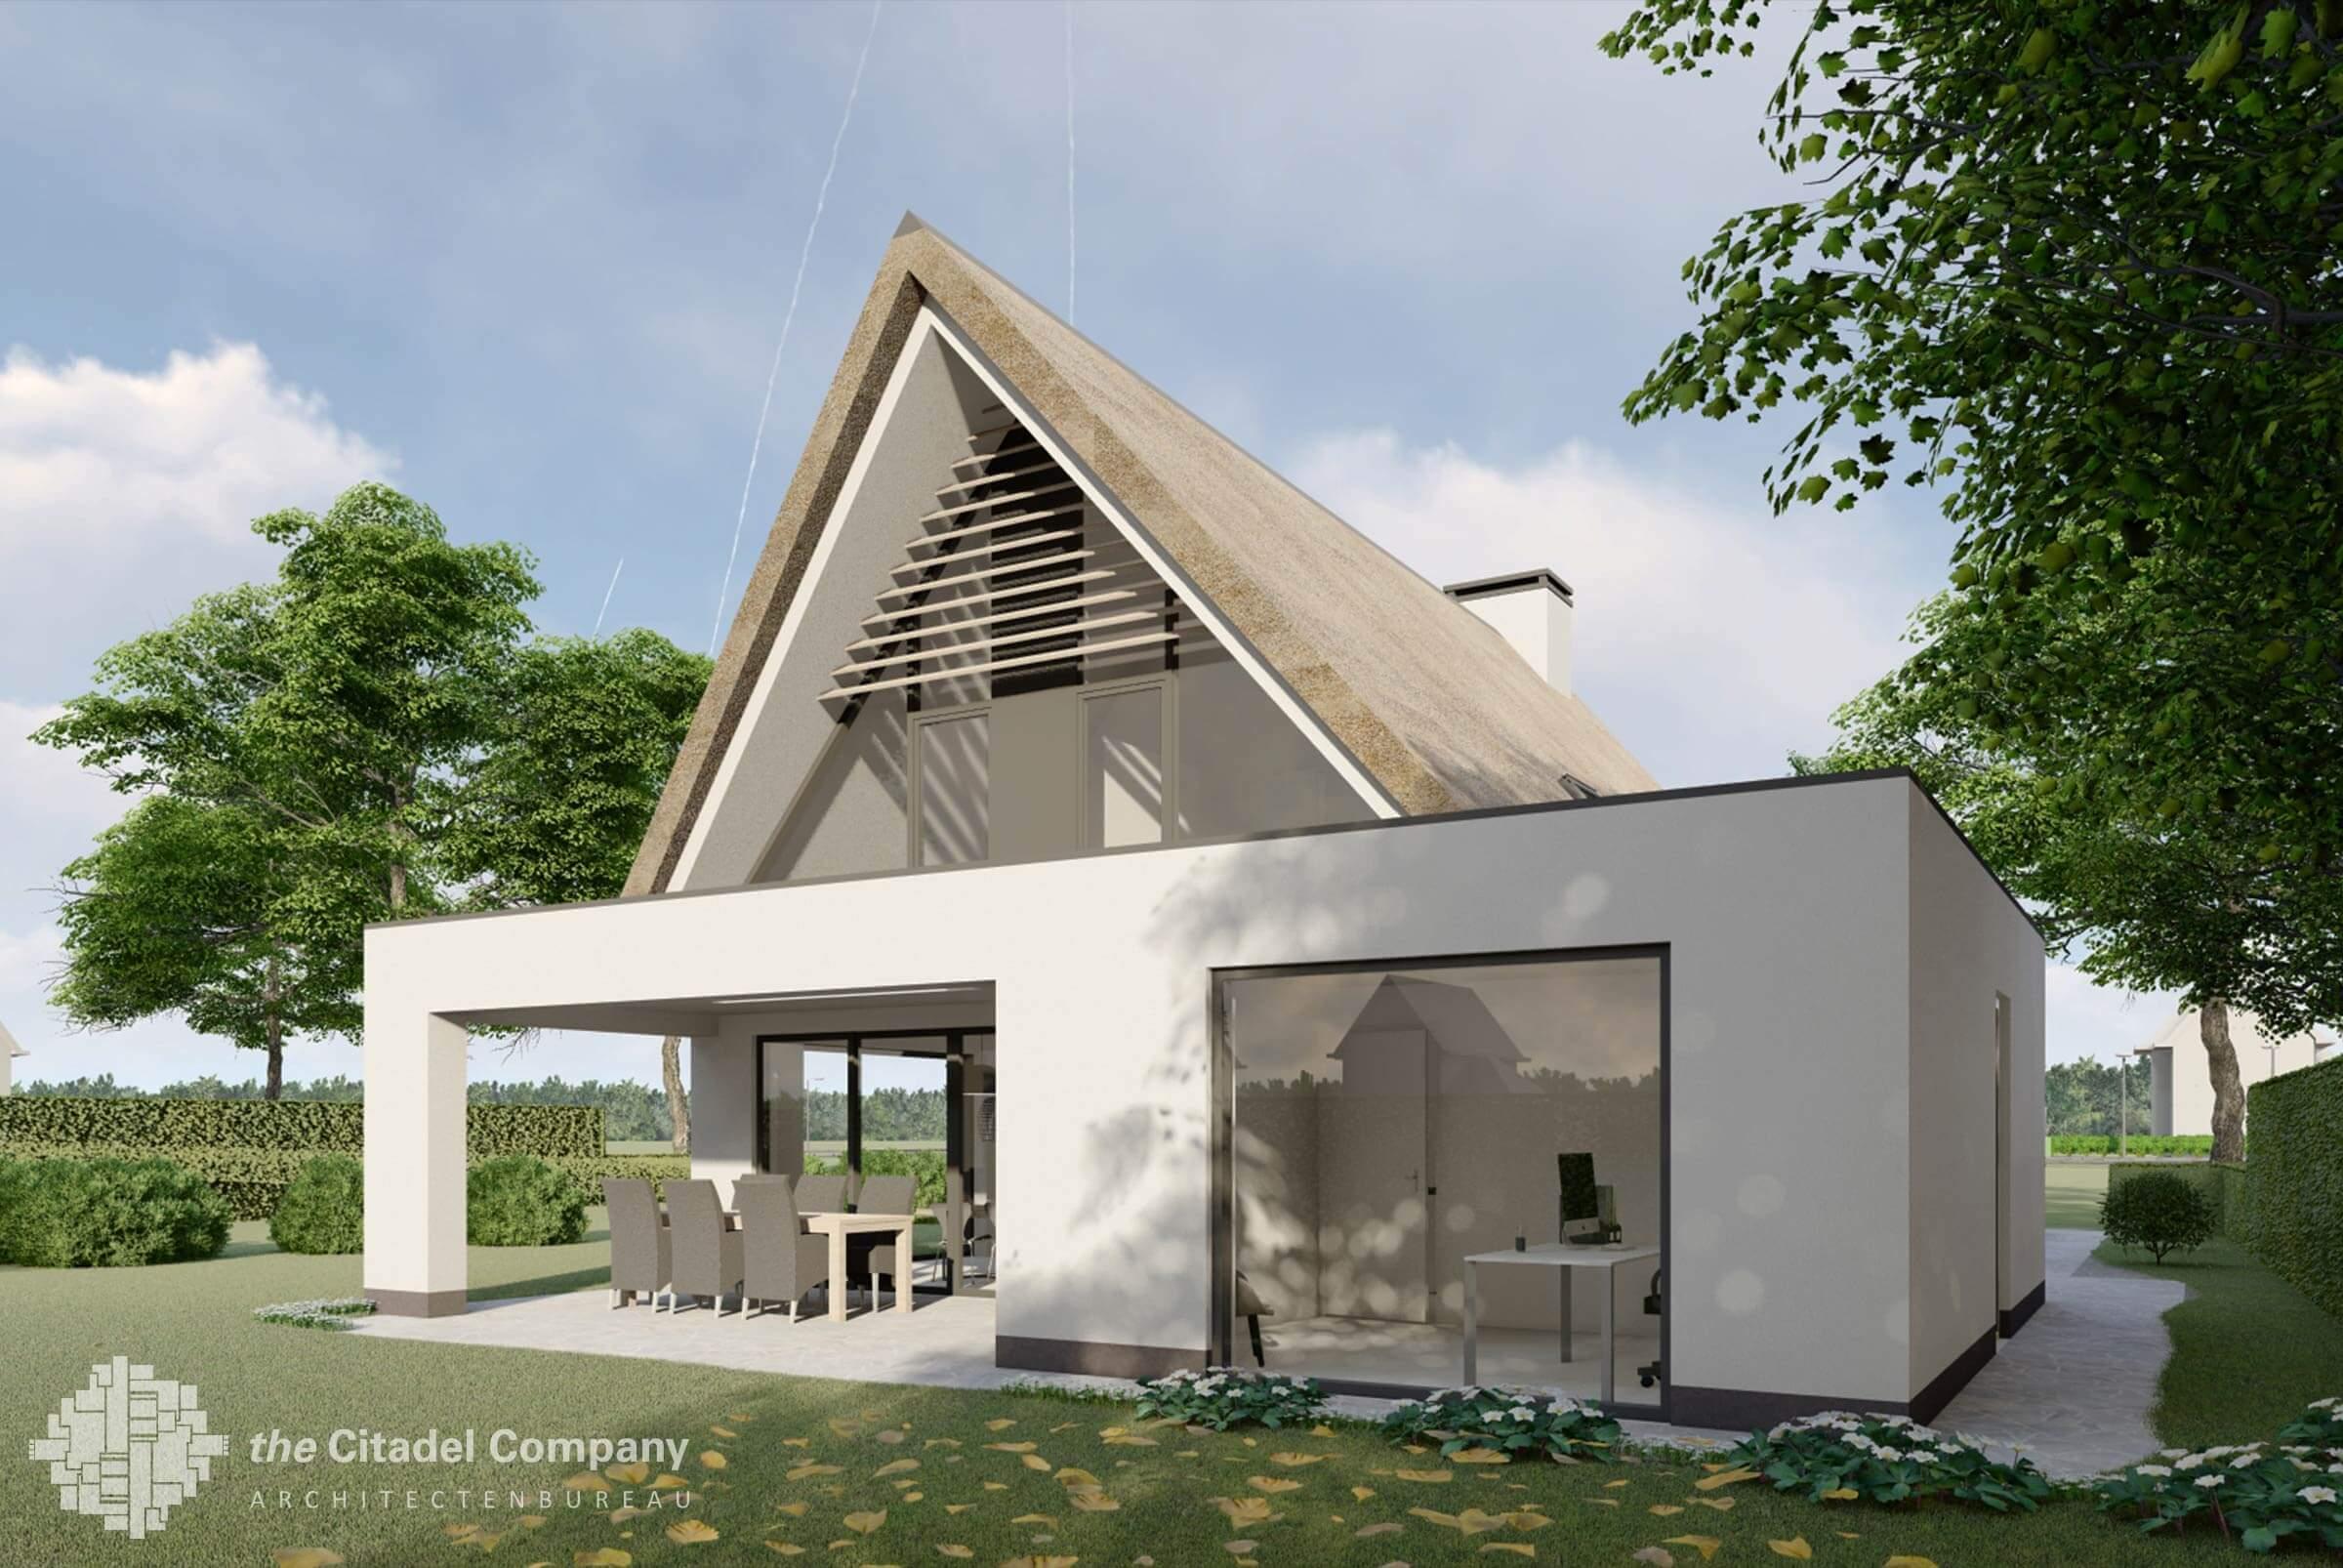 moderne strakke witte rietgedekte woning